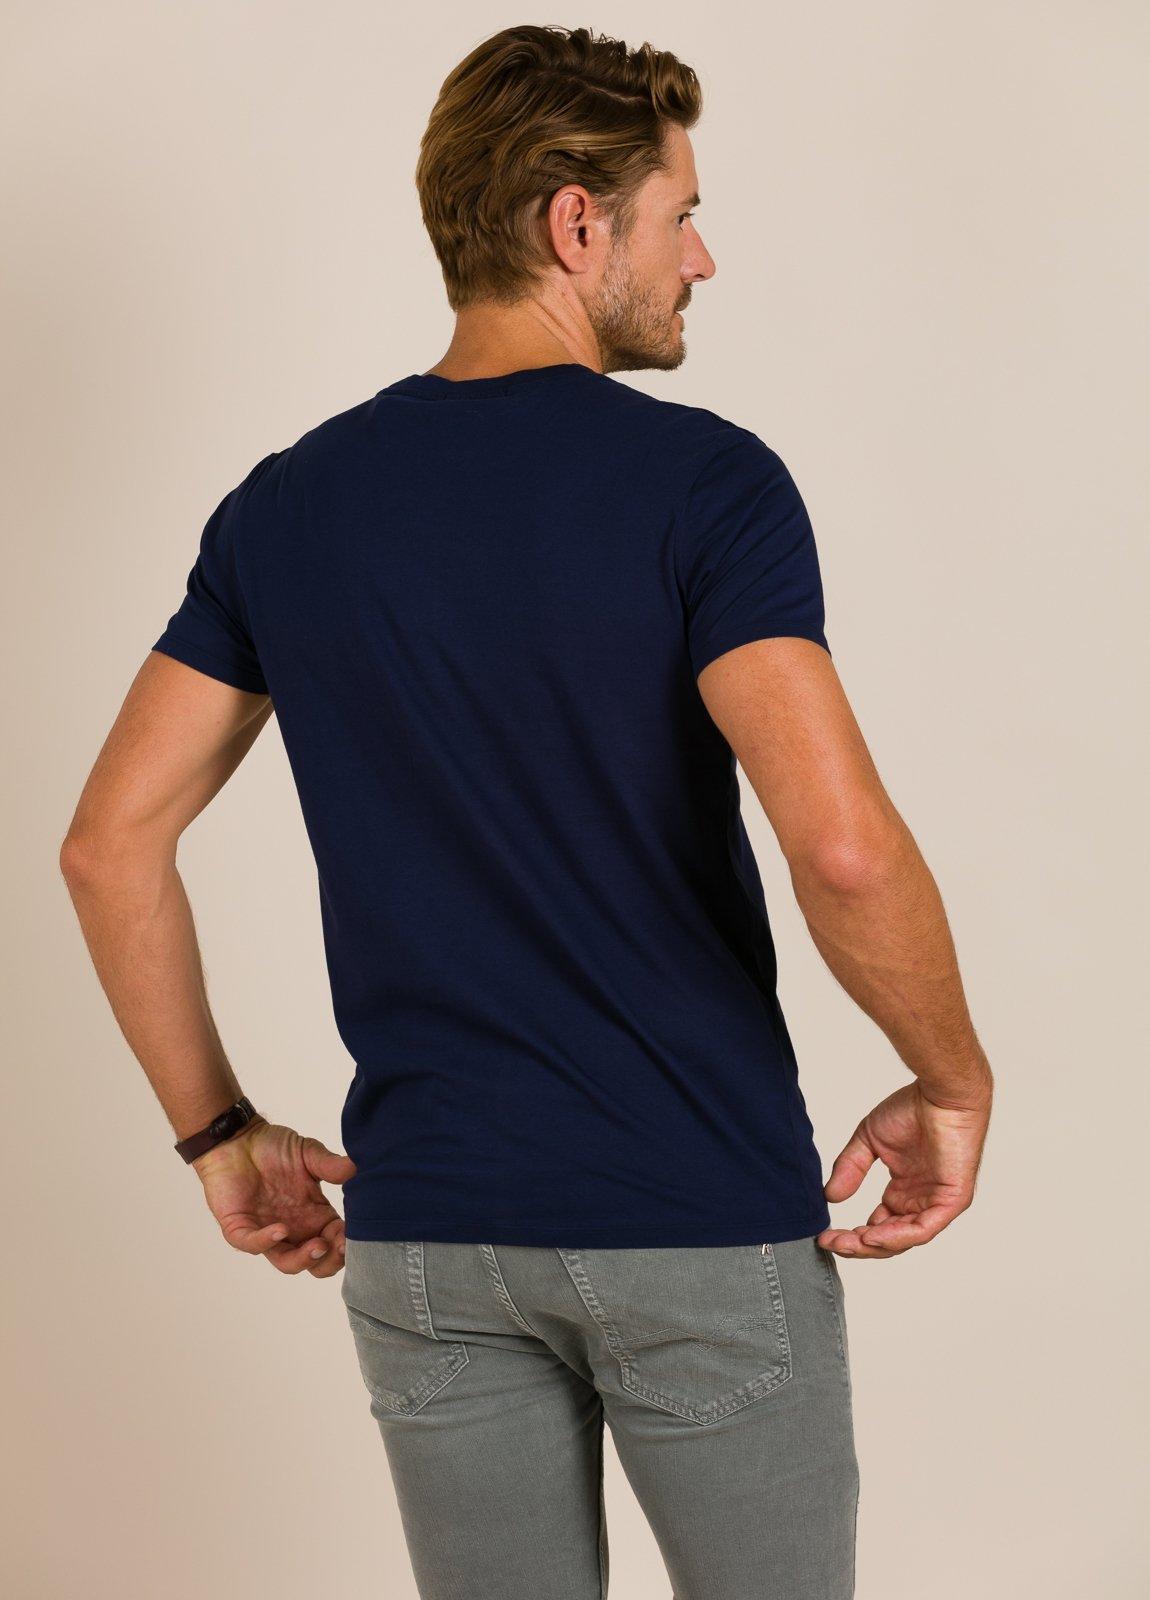 Camiseta SCOTCH & SODA azul marino - Ítem1